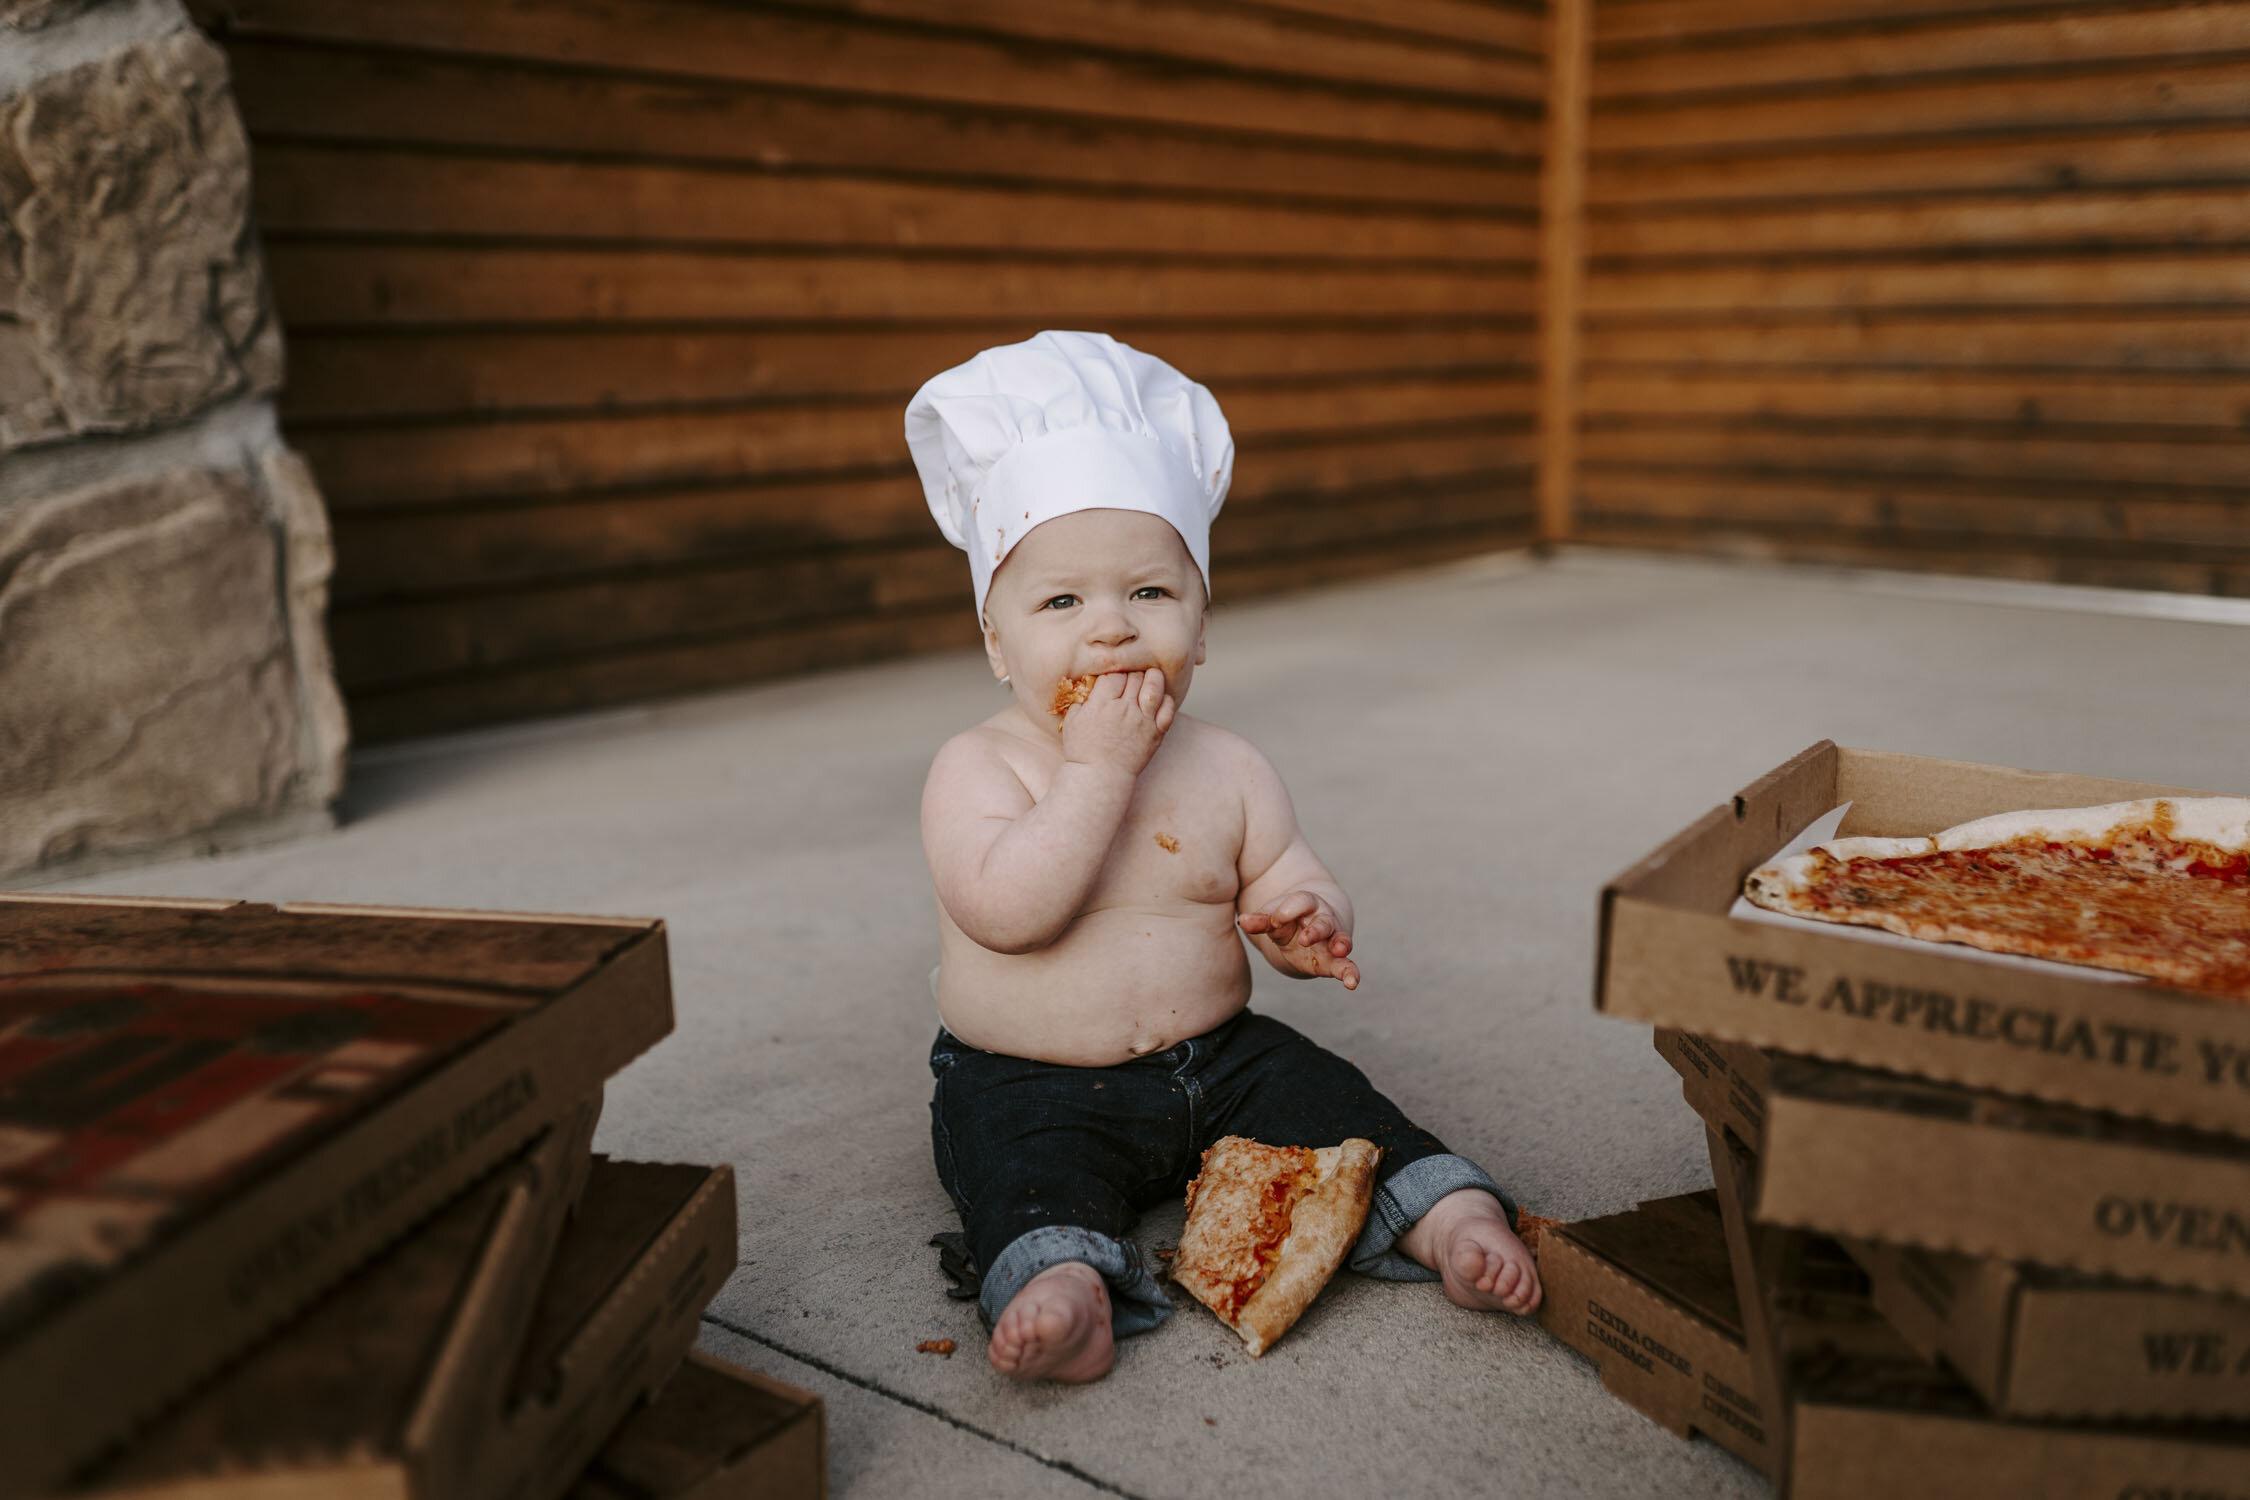 Birthday Pizza Smash, Family Portraits | Triad, NC Photographer